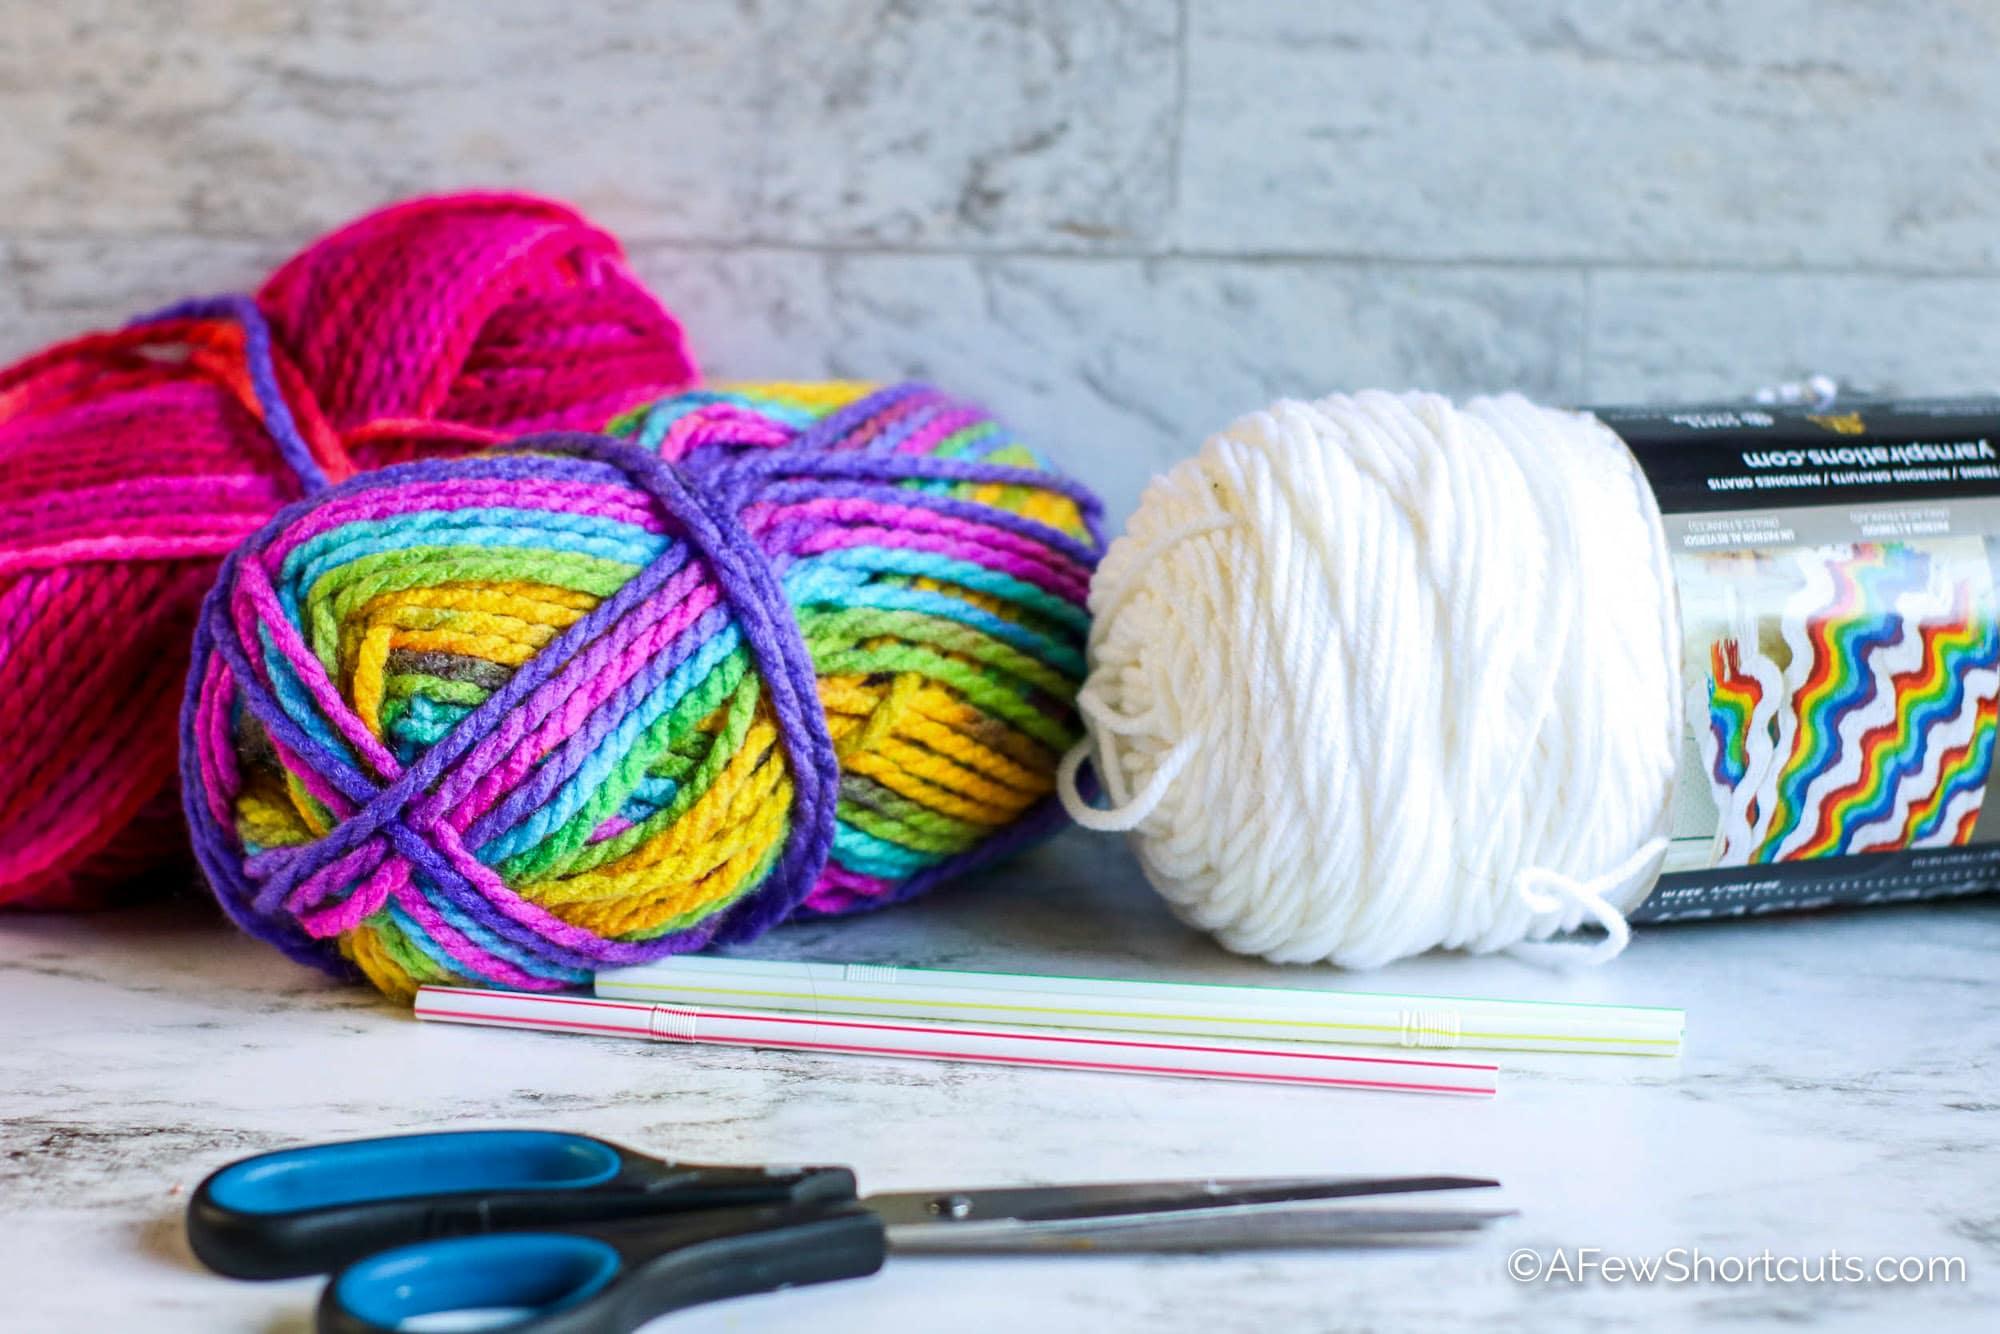 Yarn, straws, and scissors.